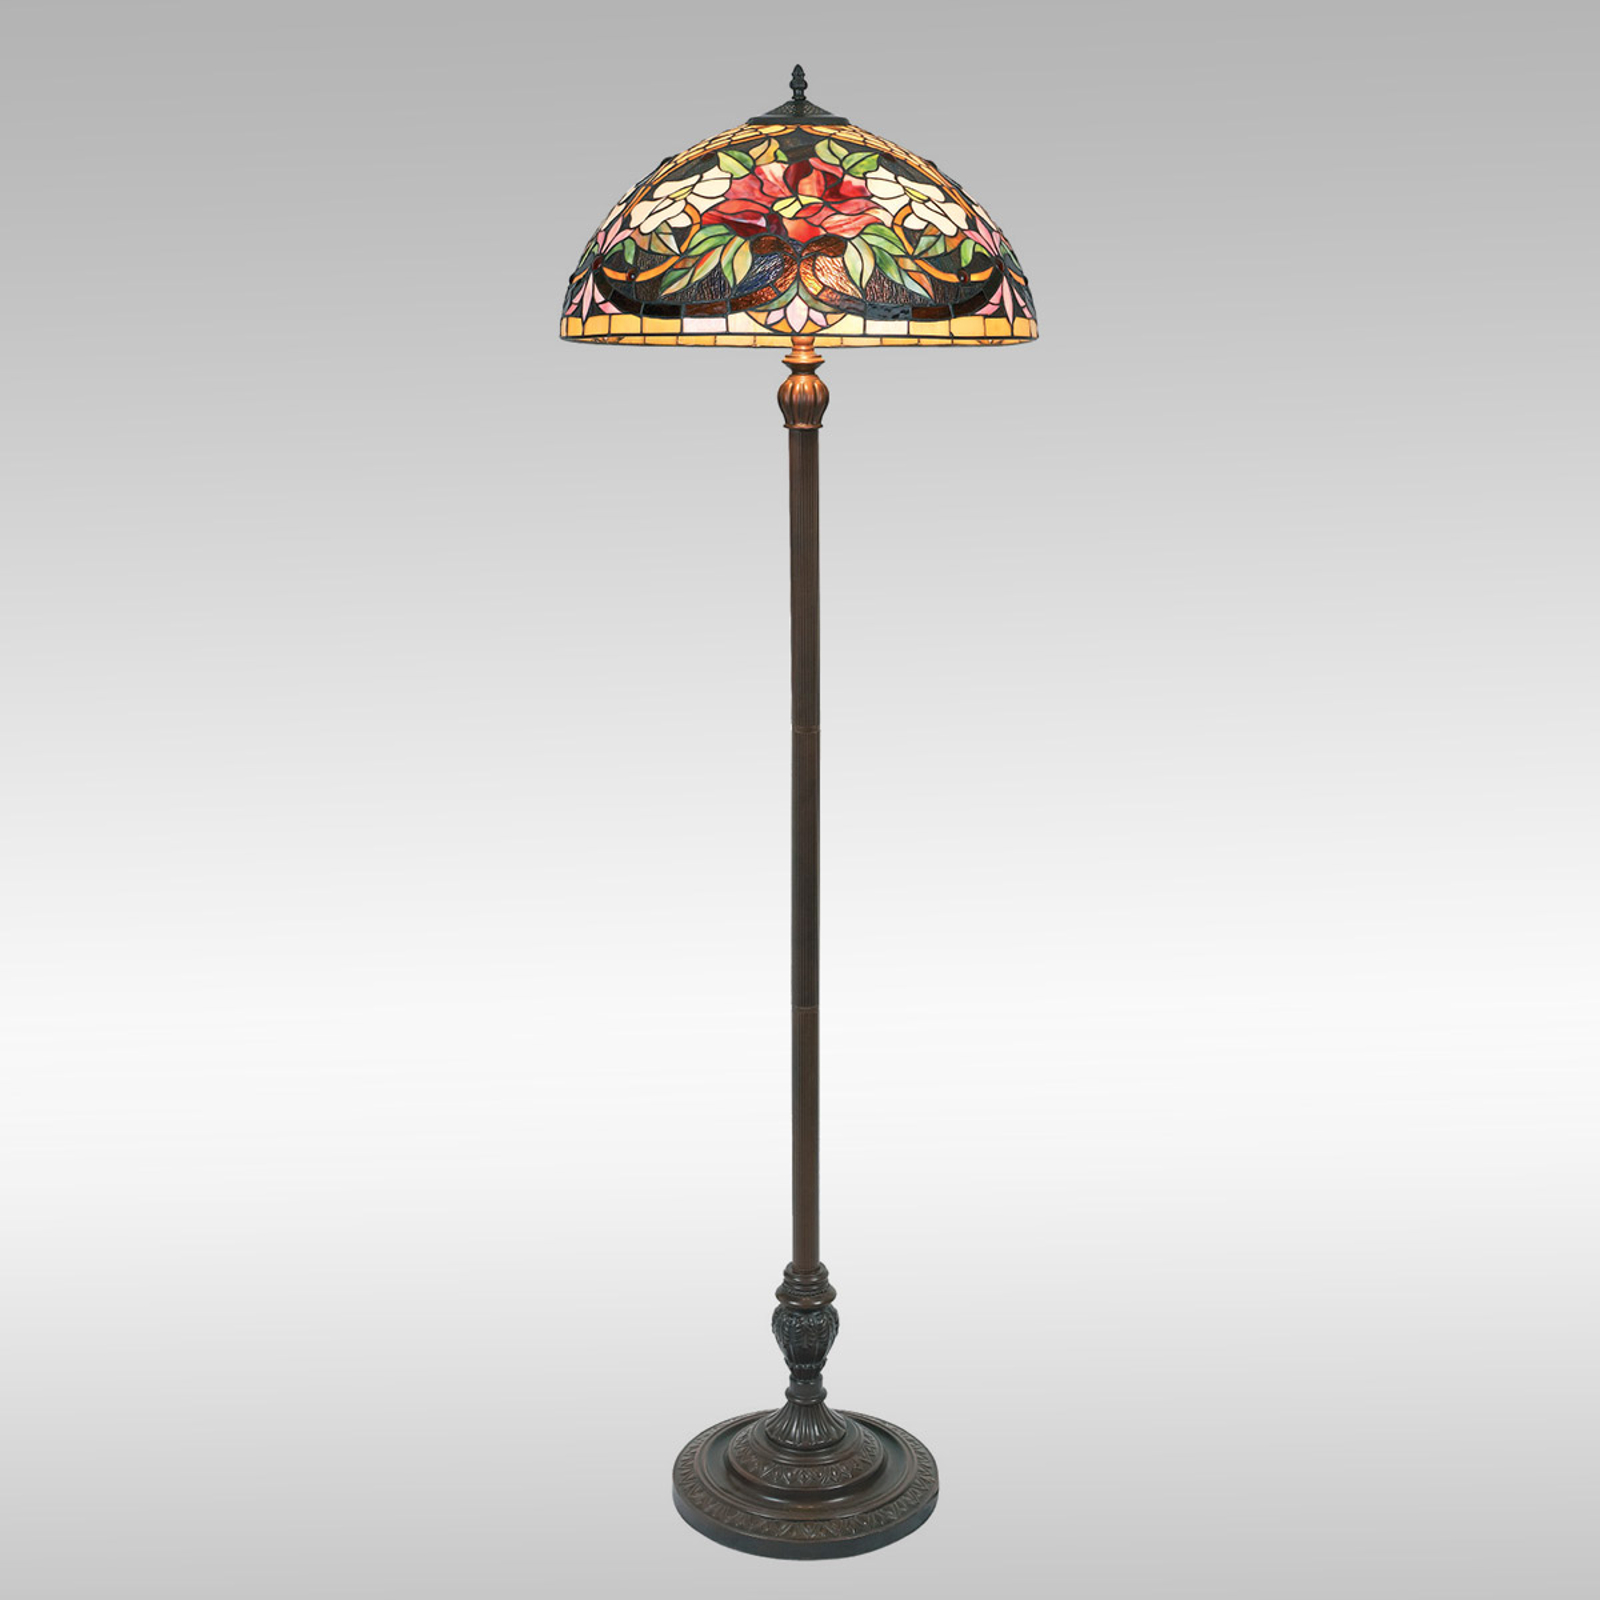 ARIADNE - farveglad gulvlampe i Tiffany stil